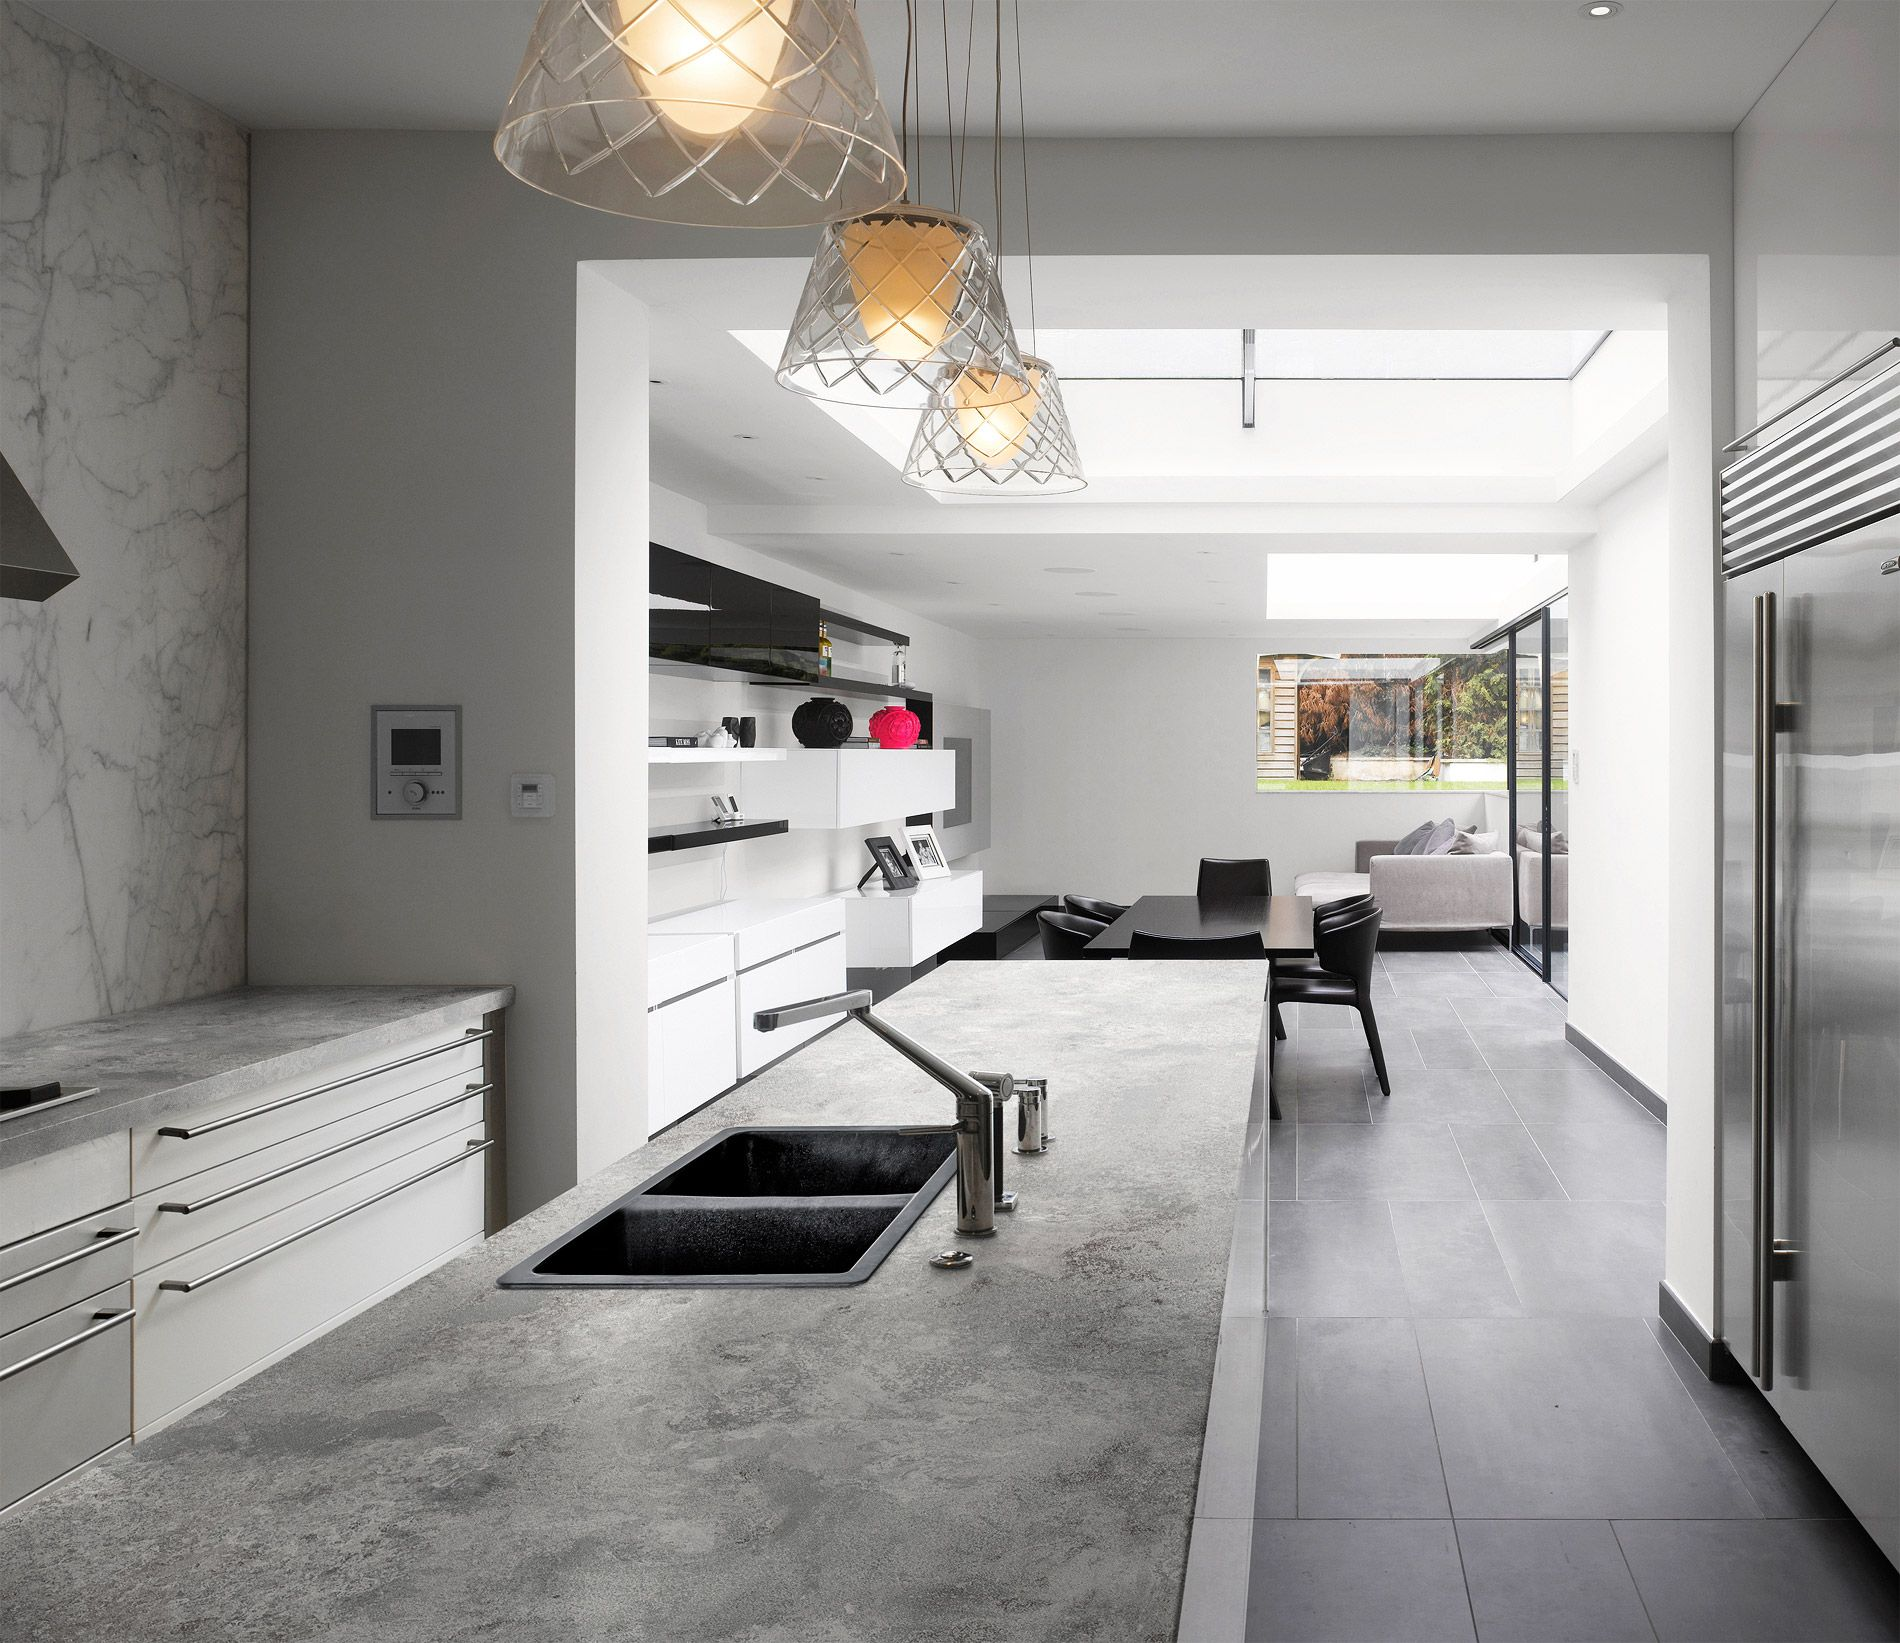 Blat Calcite Grey Concrete Kitchen Home Kitchen Inspiration Board